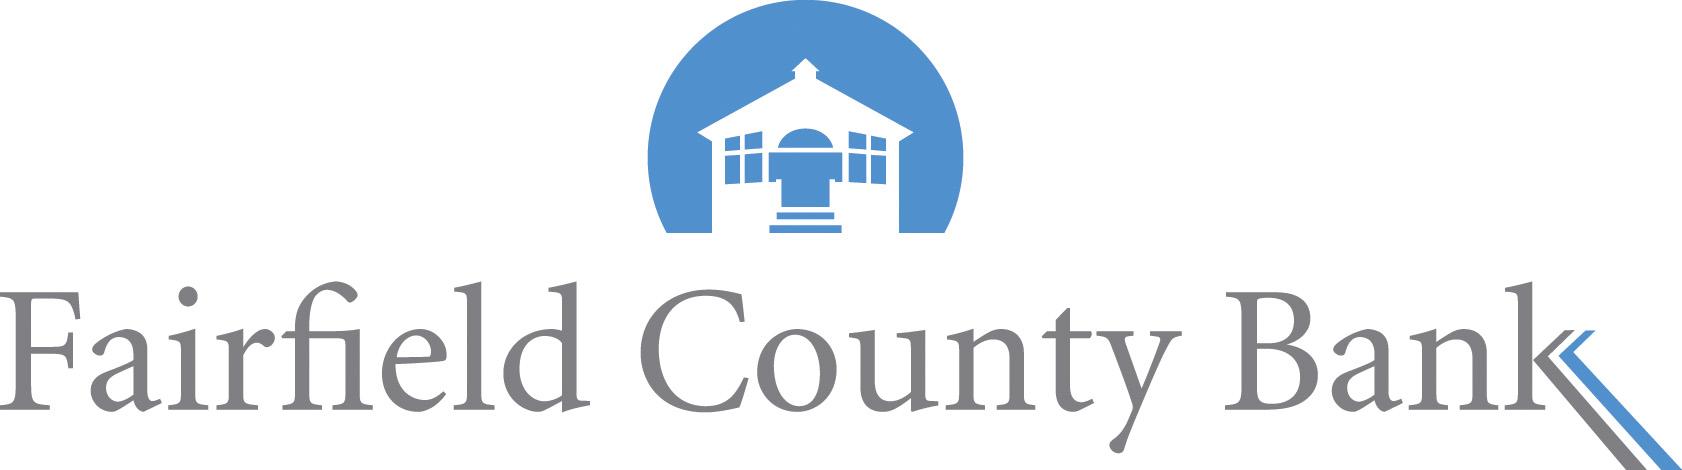 Fairfield County Bank logo